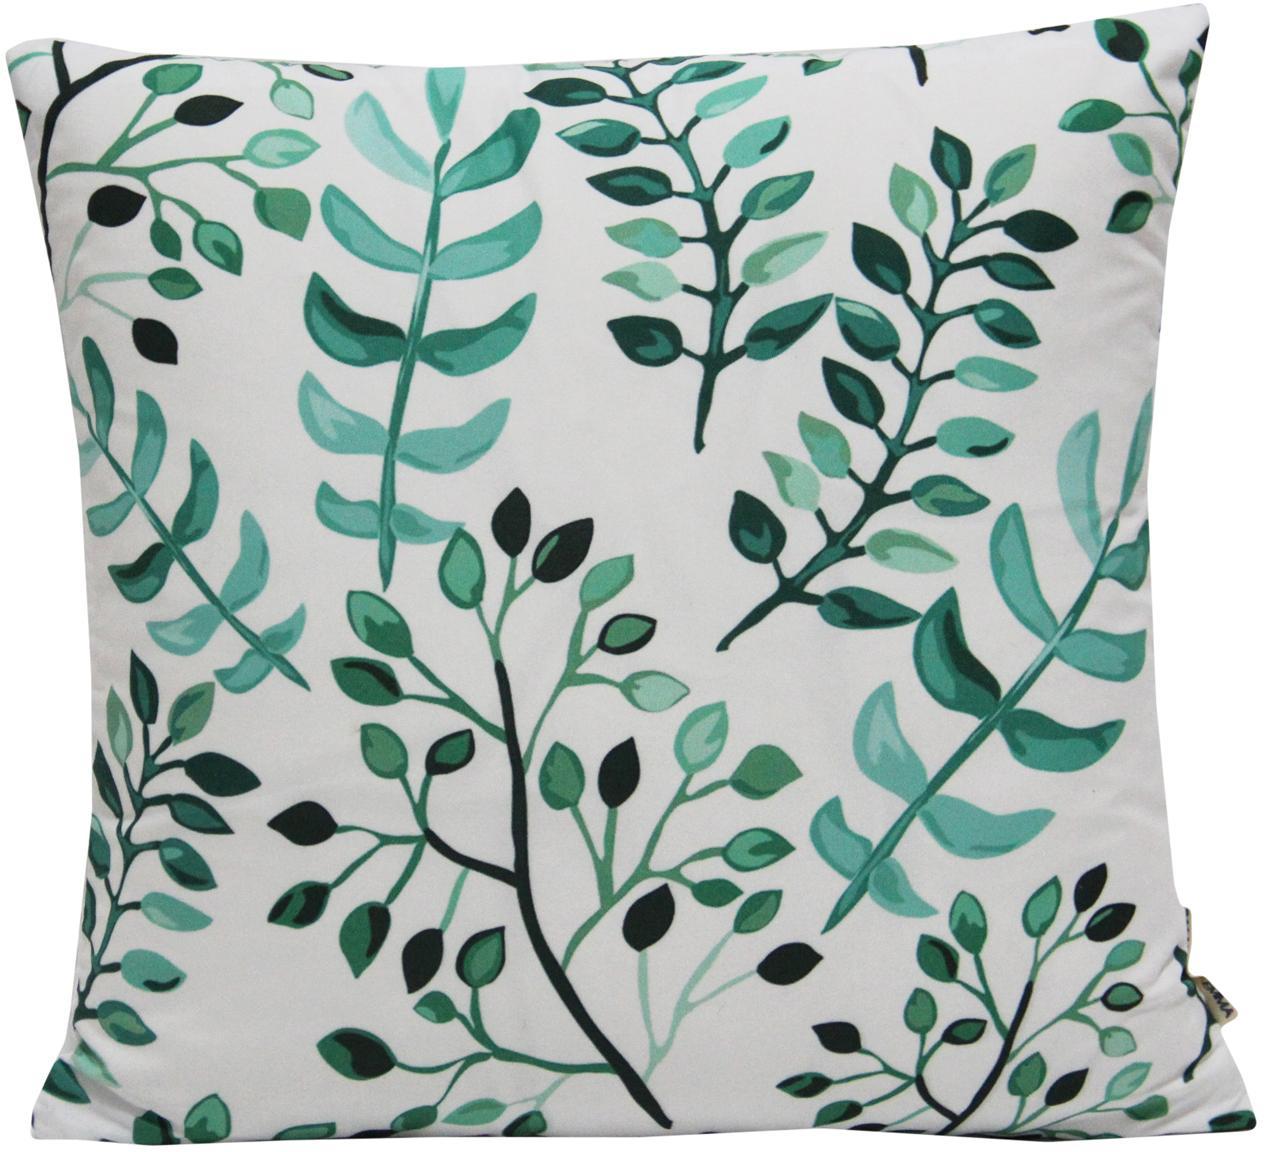 Kissenhülle Leaves mit Blattmuster, 100% Polyester, Weiß, Grüntöne, 40 x 40 cm